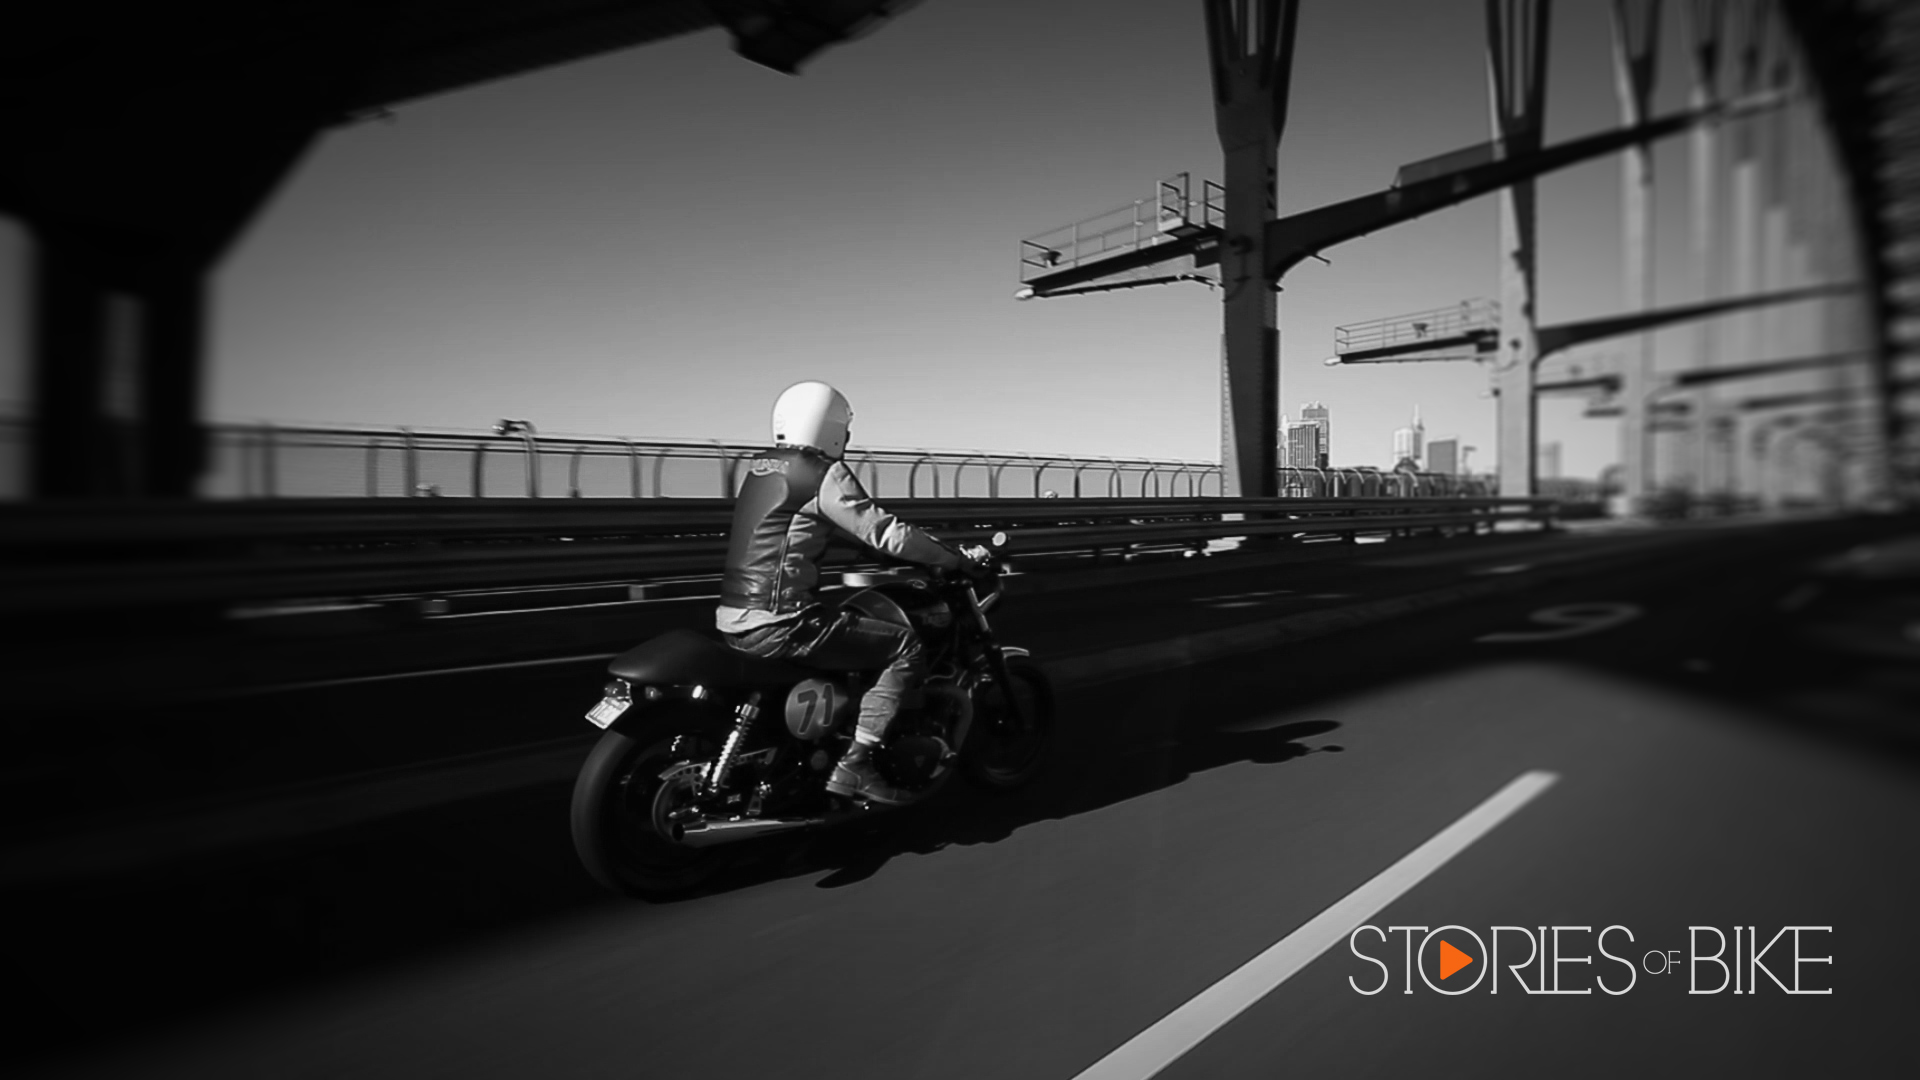 Stories_Of_Bike_Episode6_7.jpg